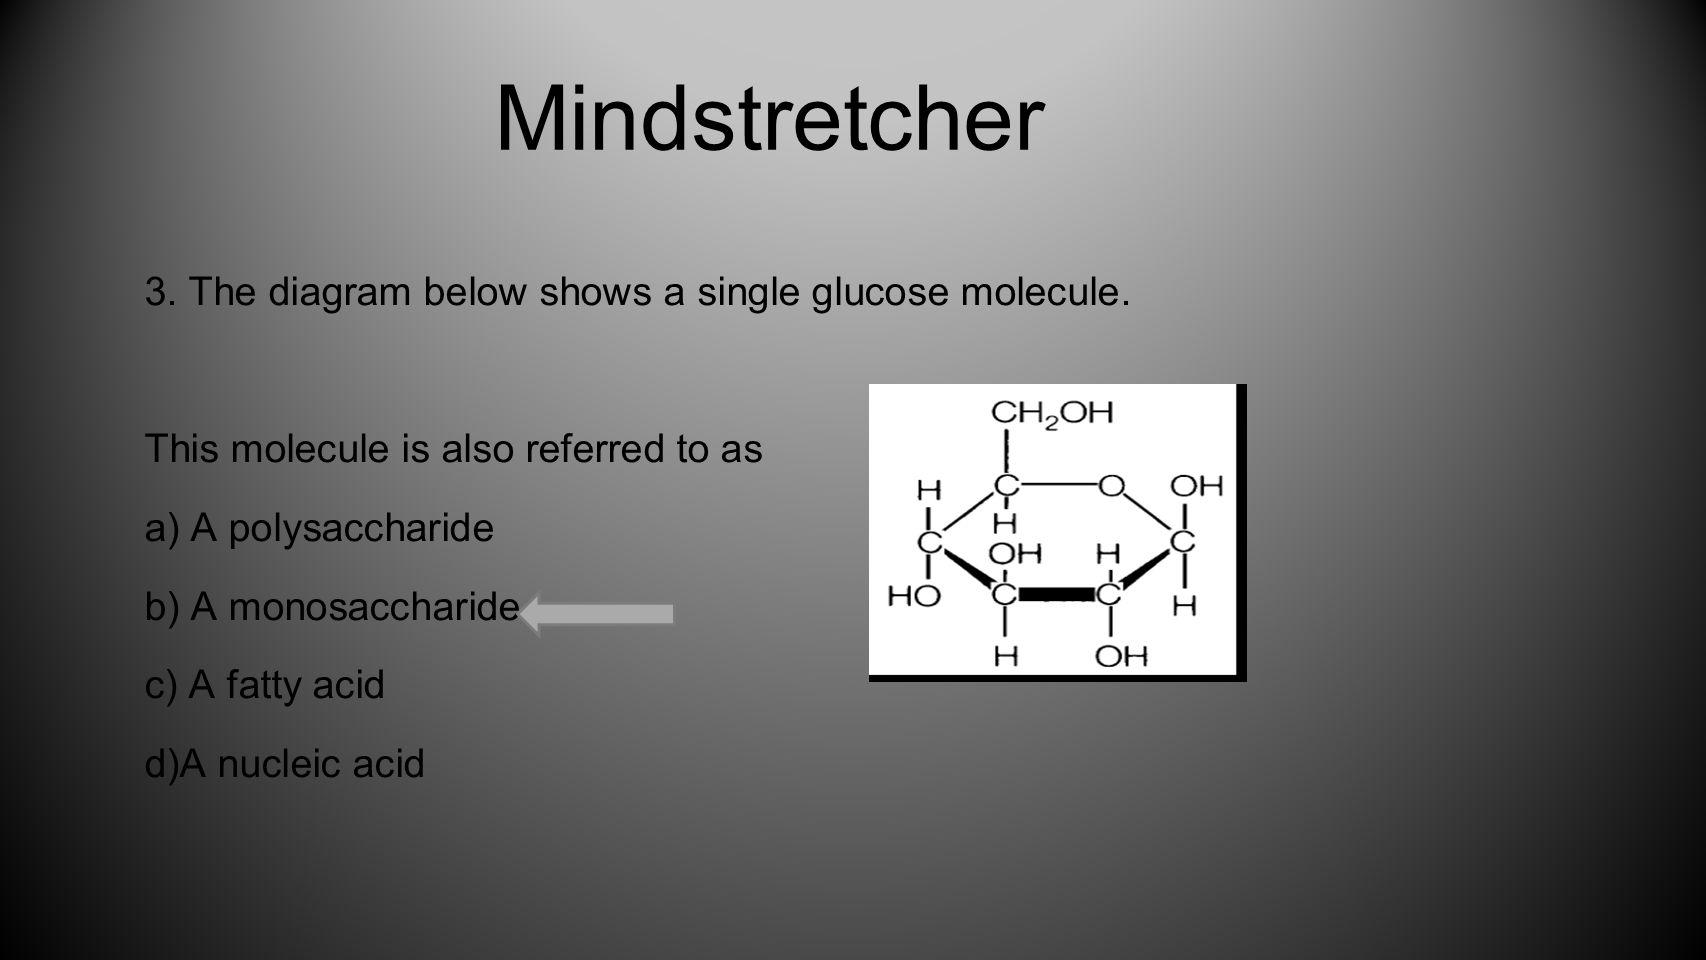 3.The diagram below shows a single glucose molecule.